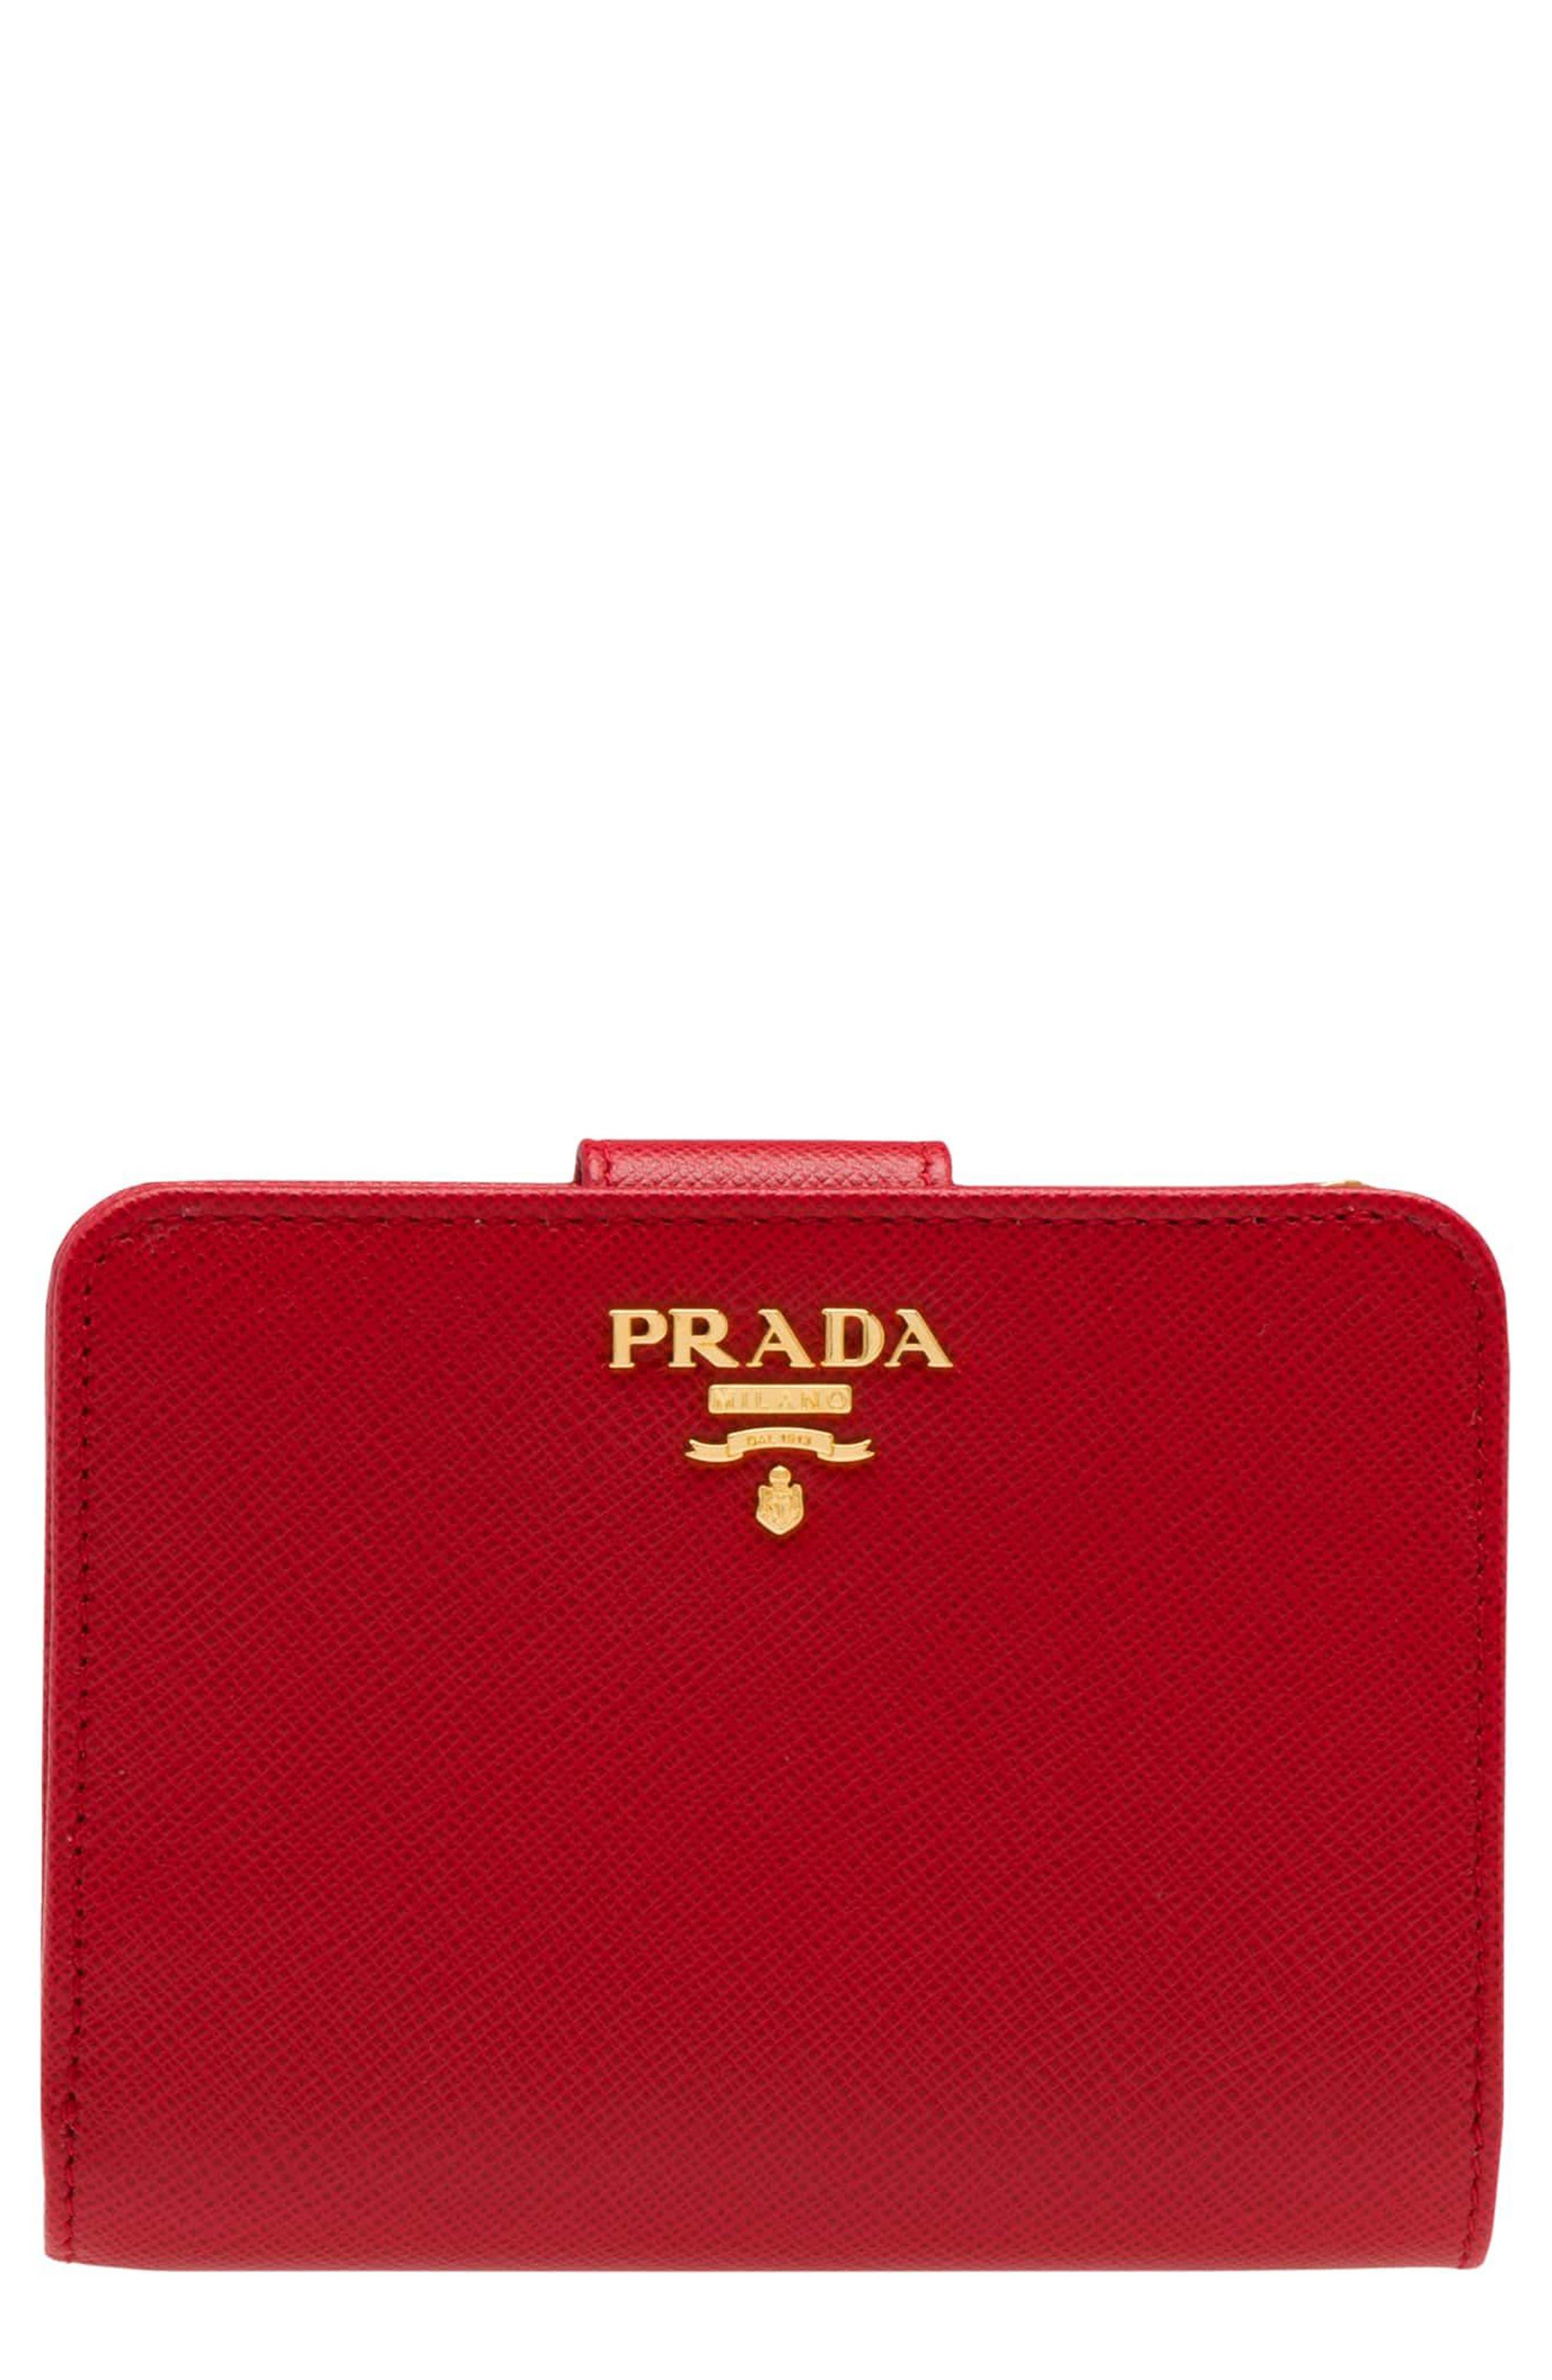 Prada Small Saffiano Tab Wallet